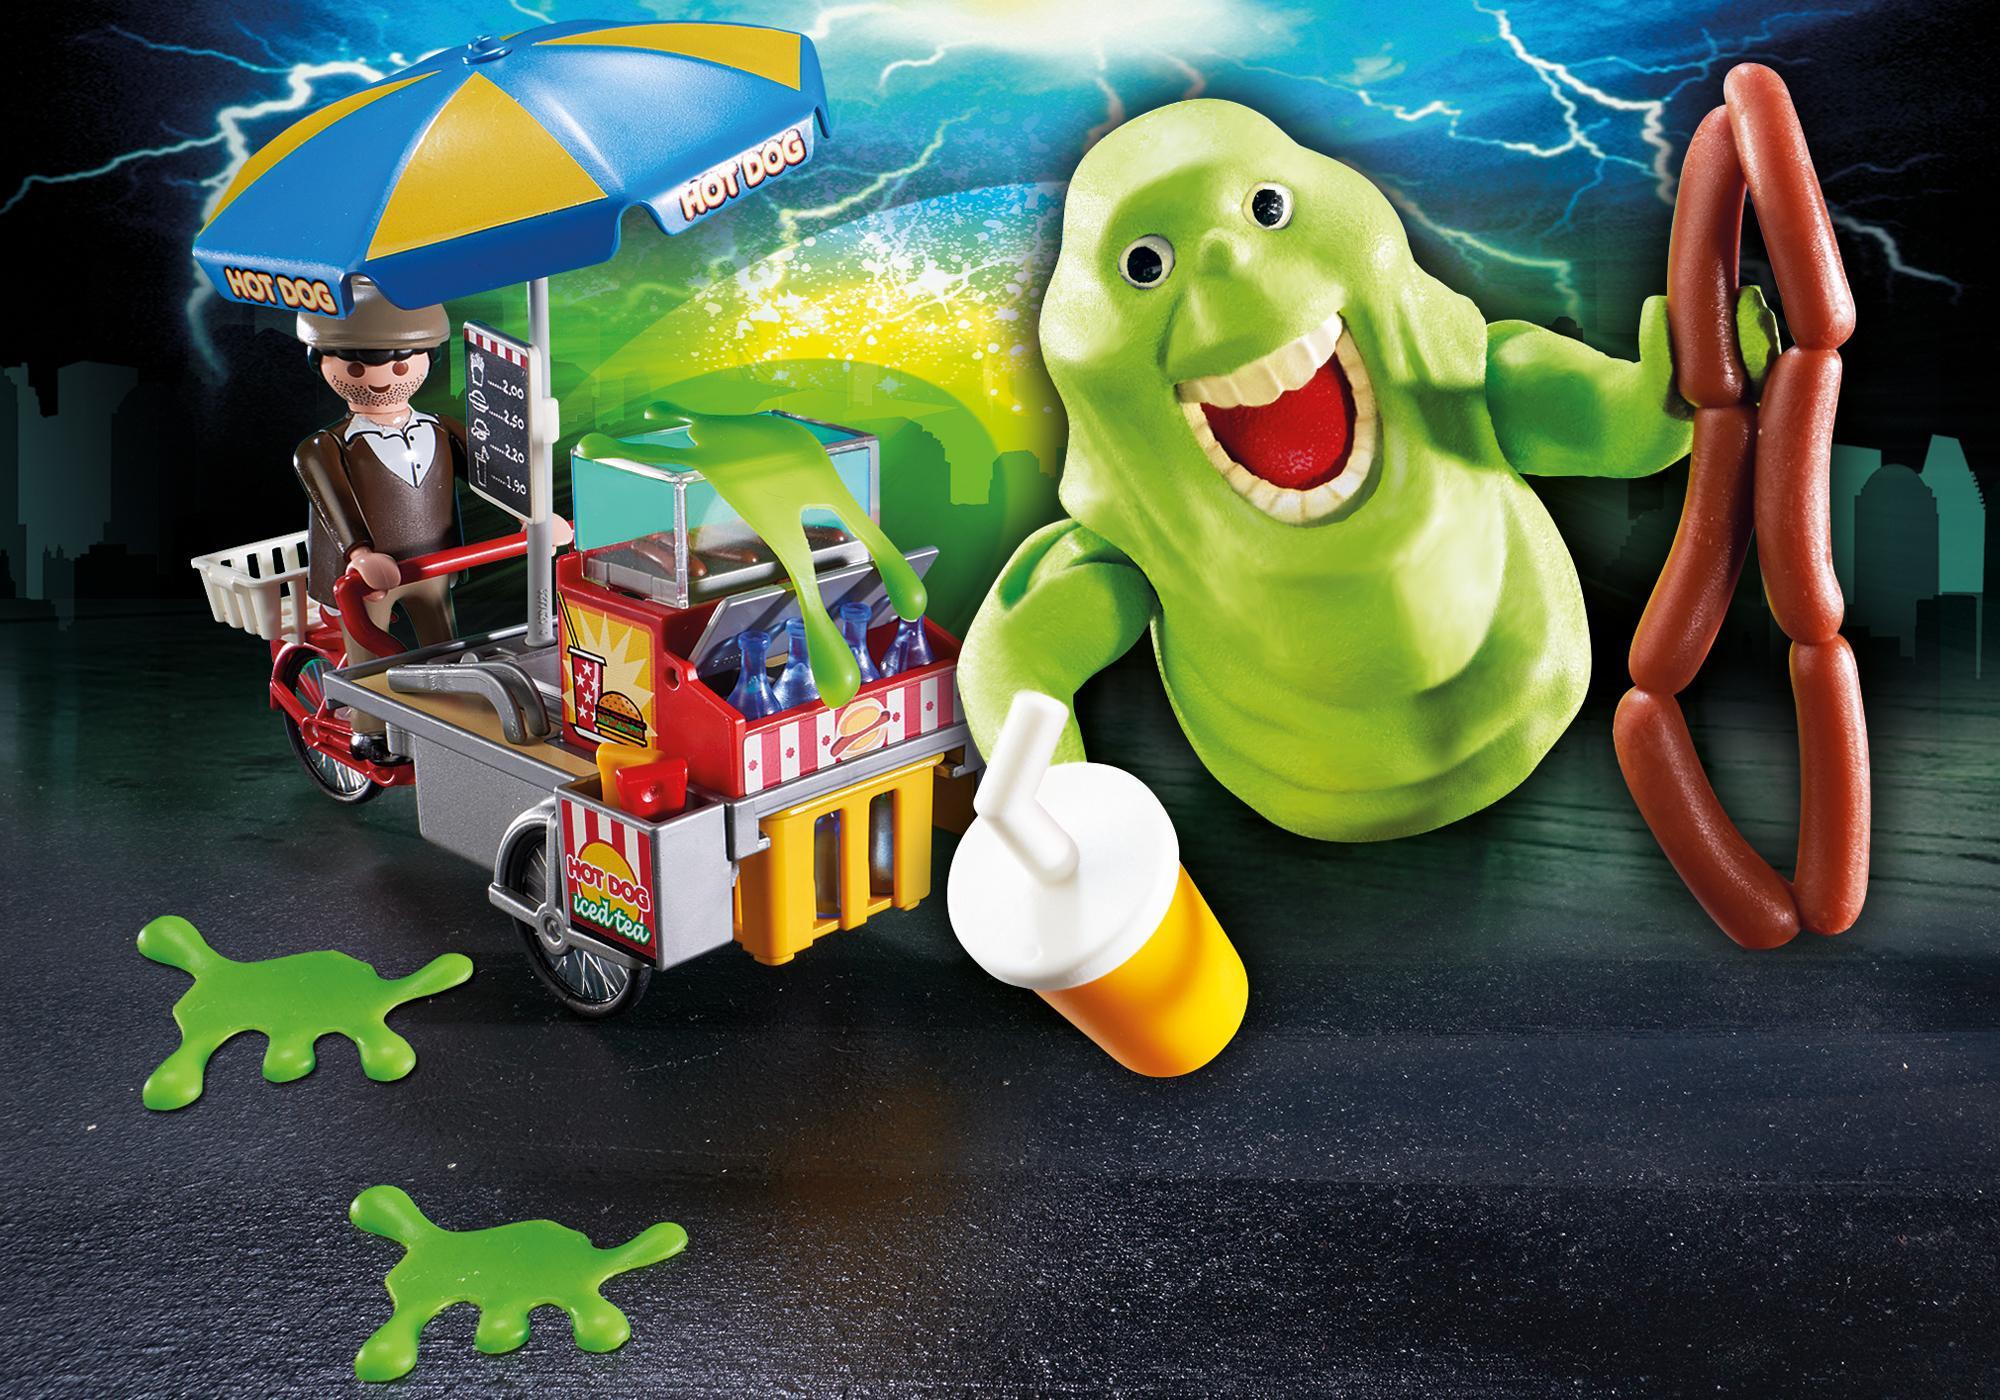 http://media.playmobil.com/i/playmobil/9222_product_extra1/Лизун и торговая тележка с хот-догами